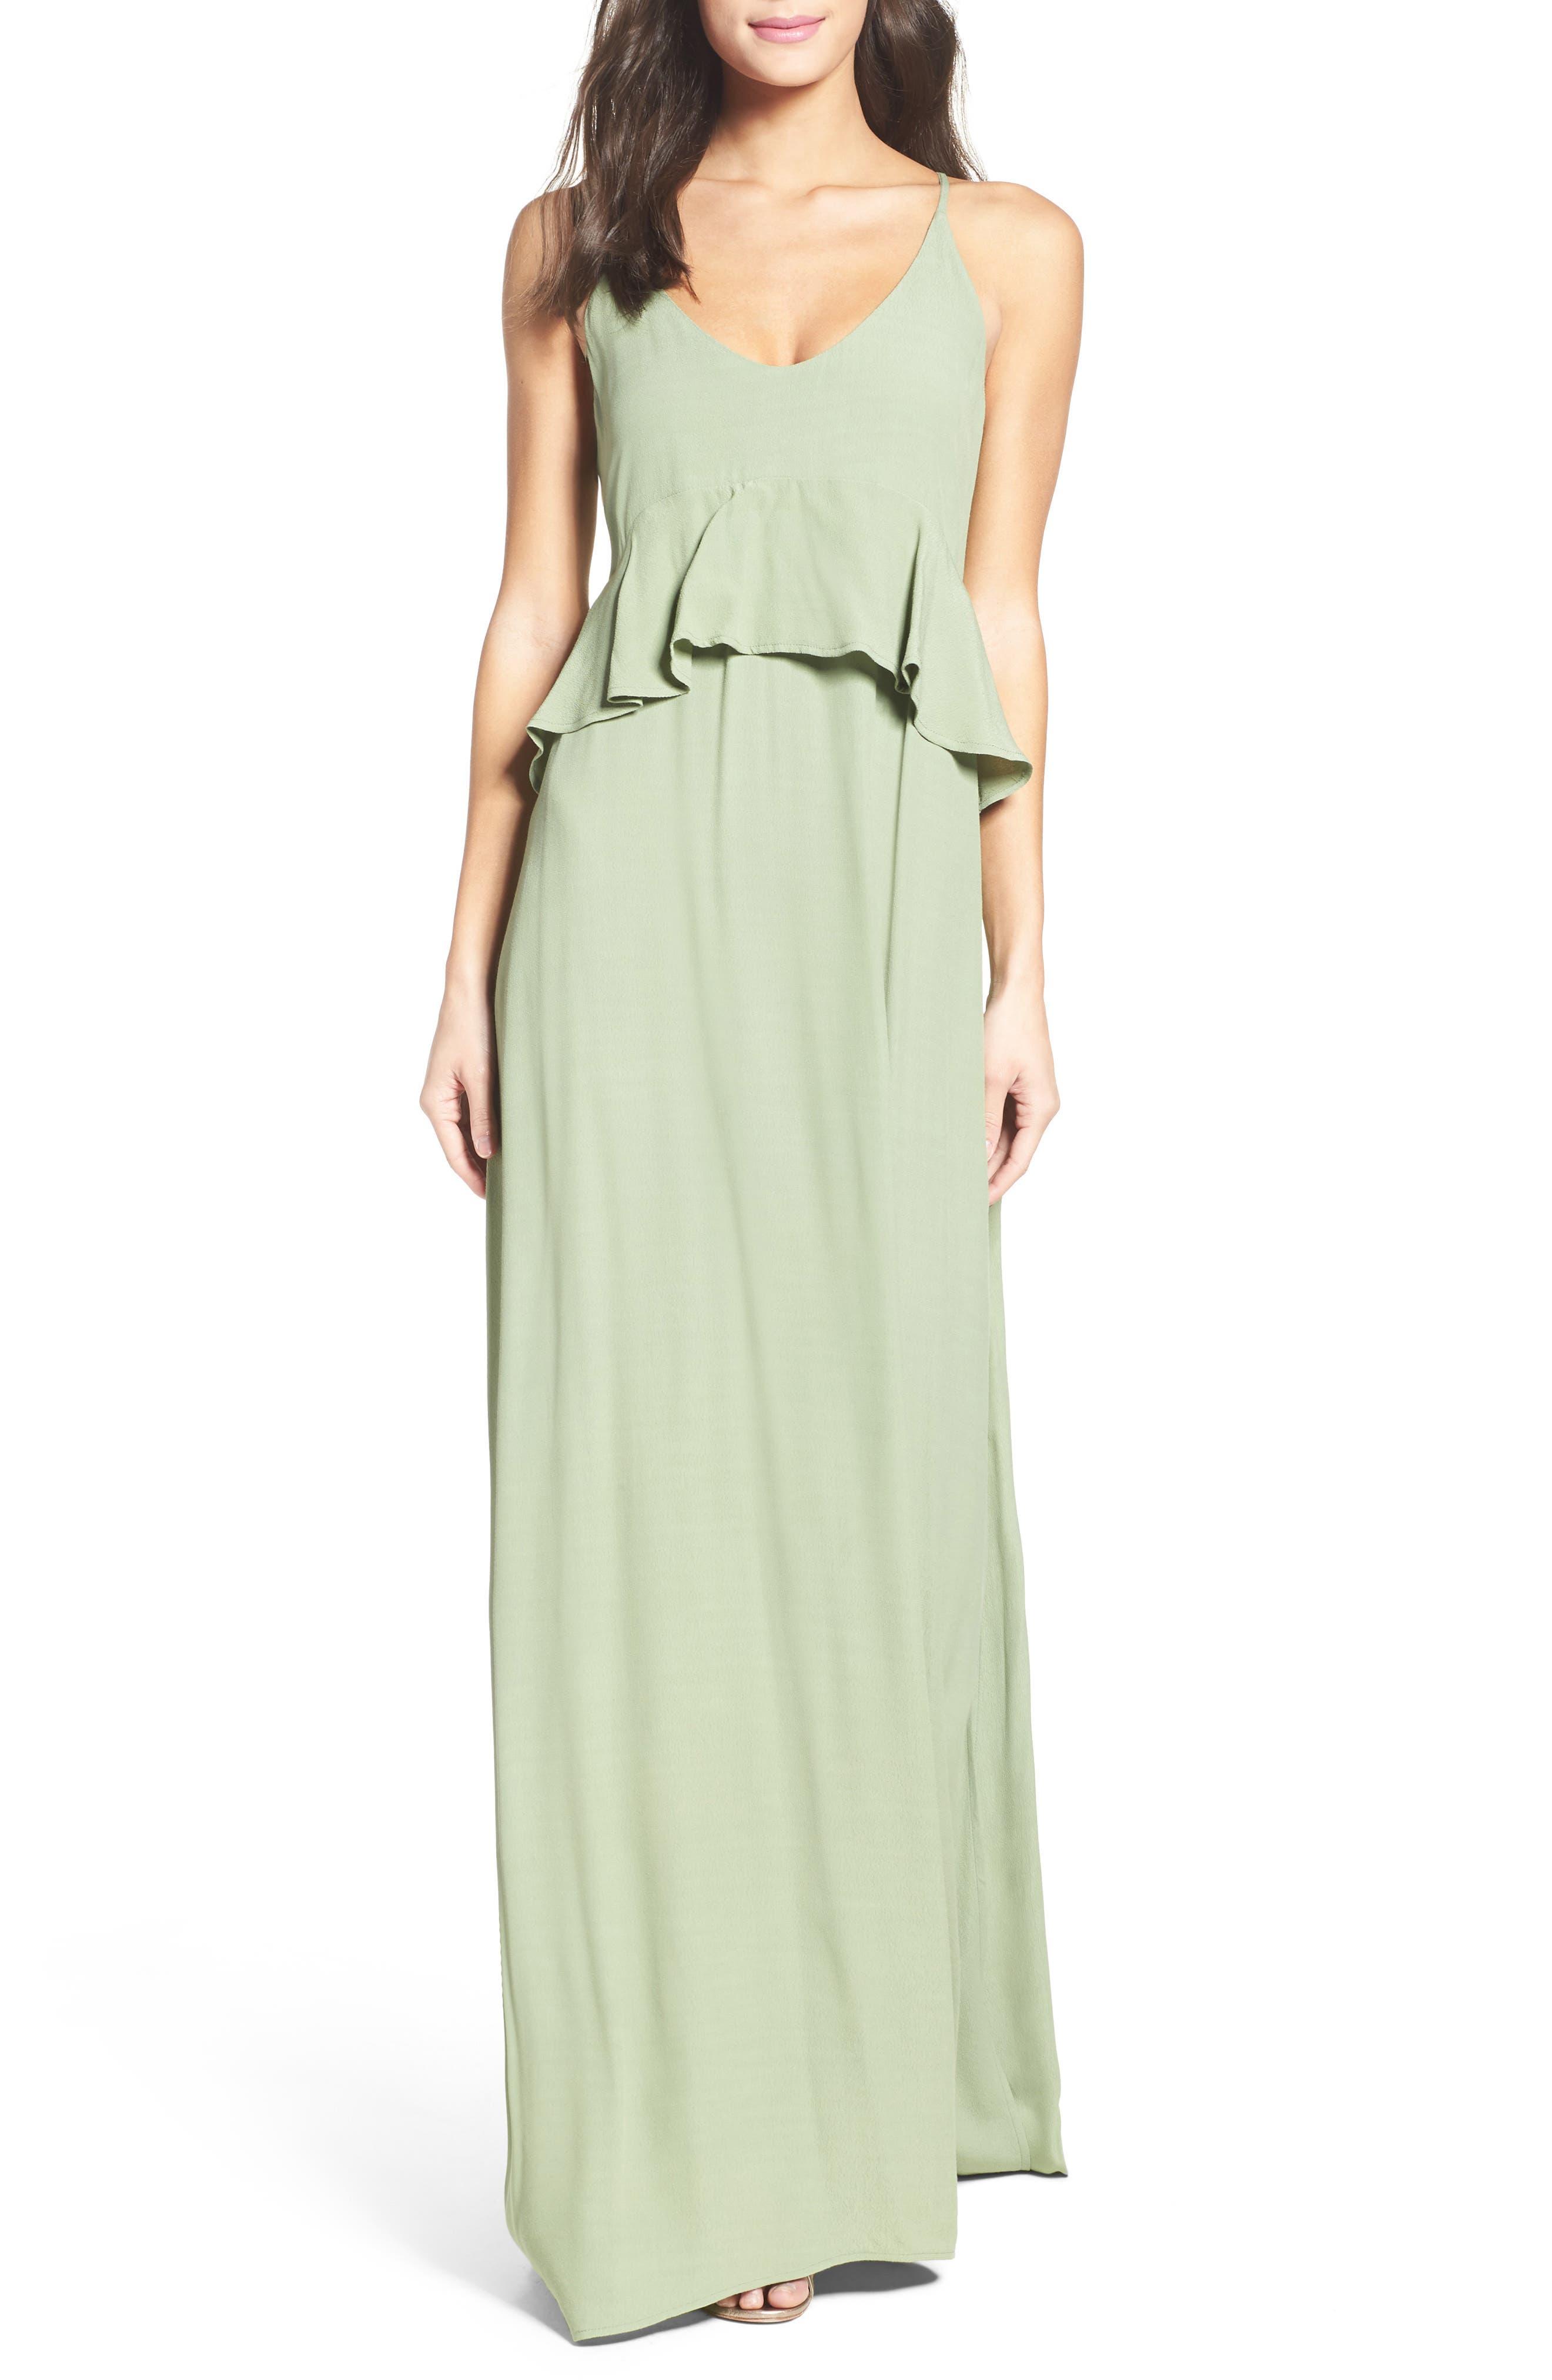 Main Image - Roe + May Jolie Crepe Peplum Dress